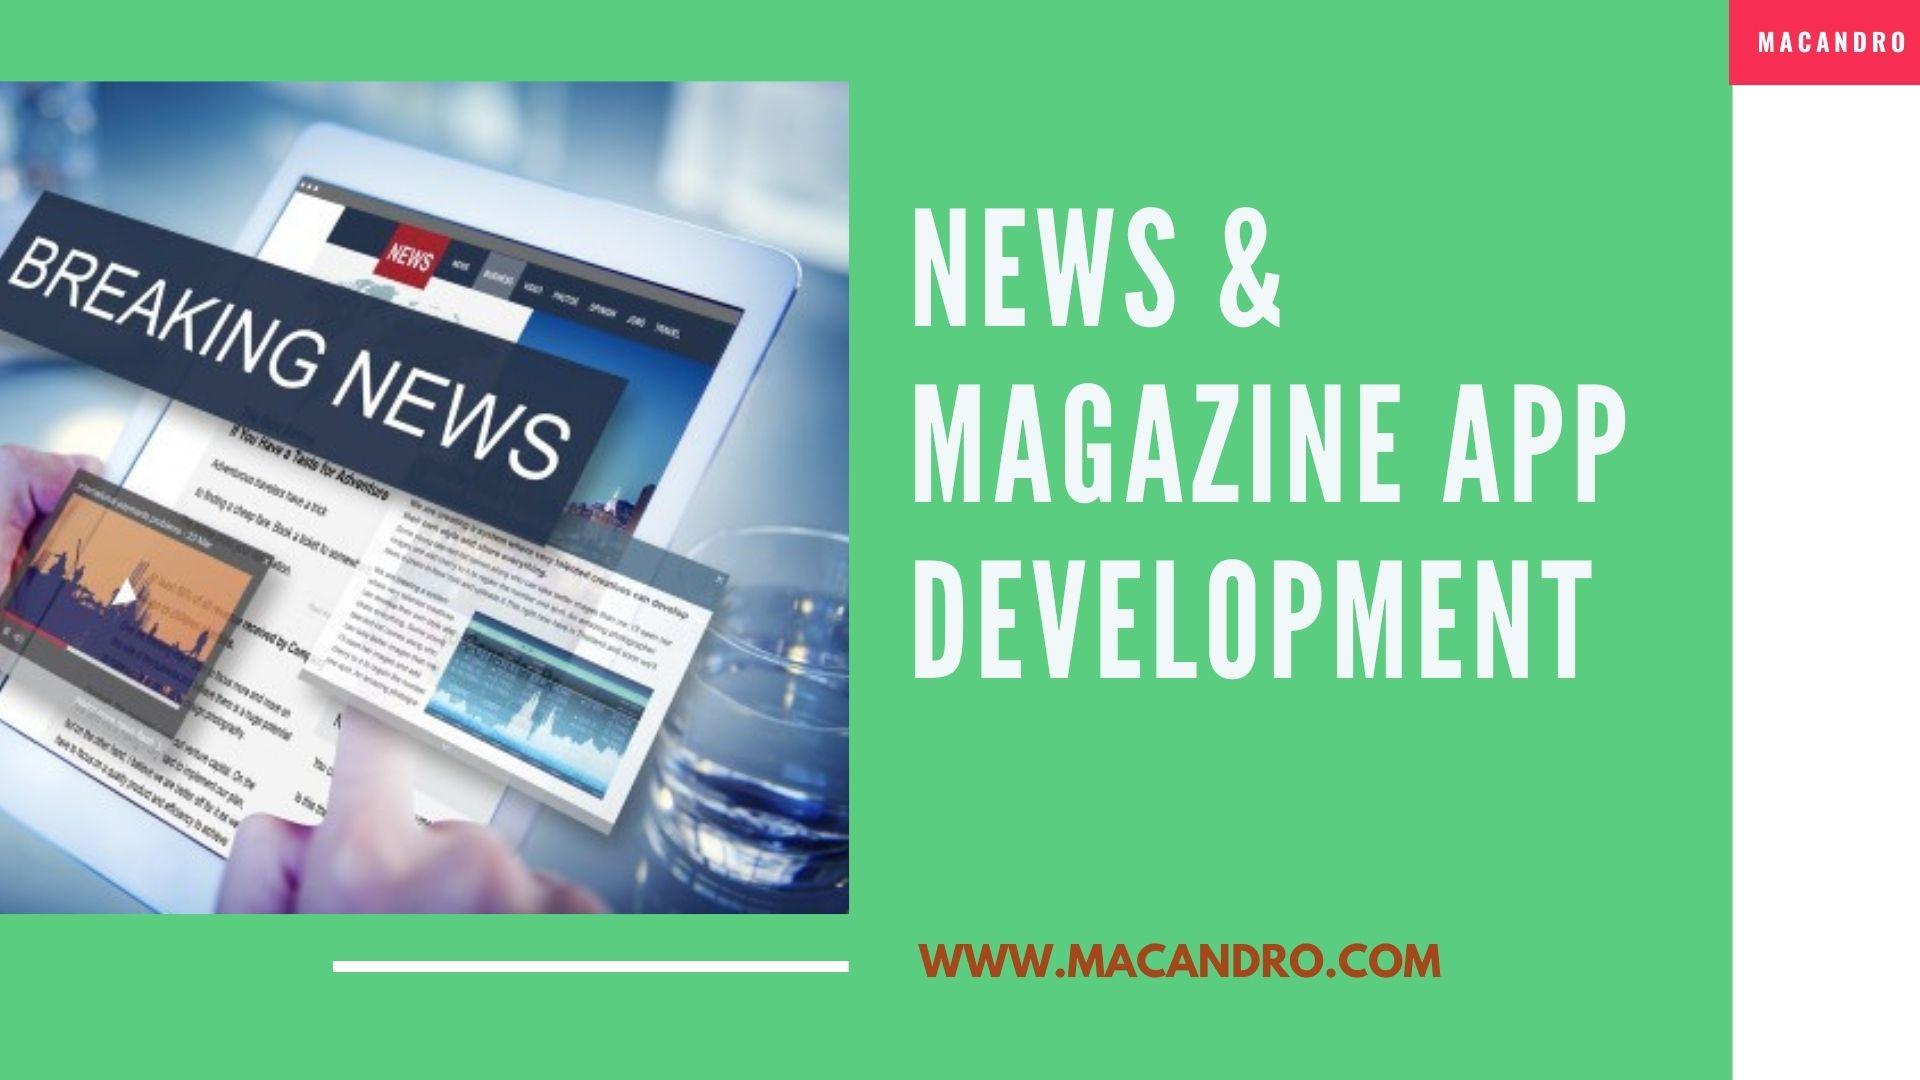 MacAndro Initiates News App Development Services